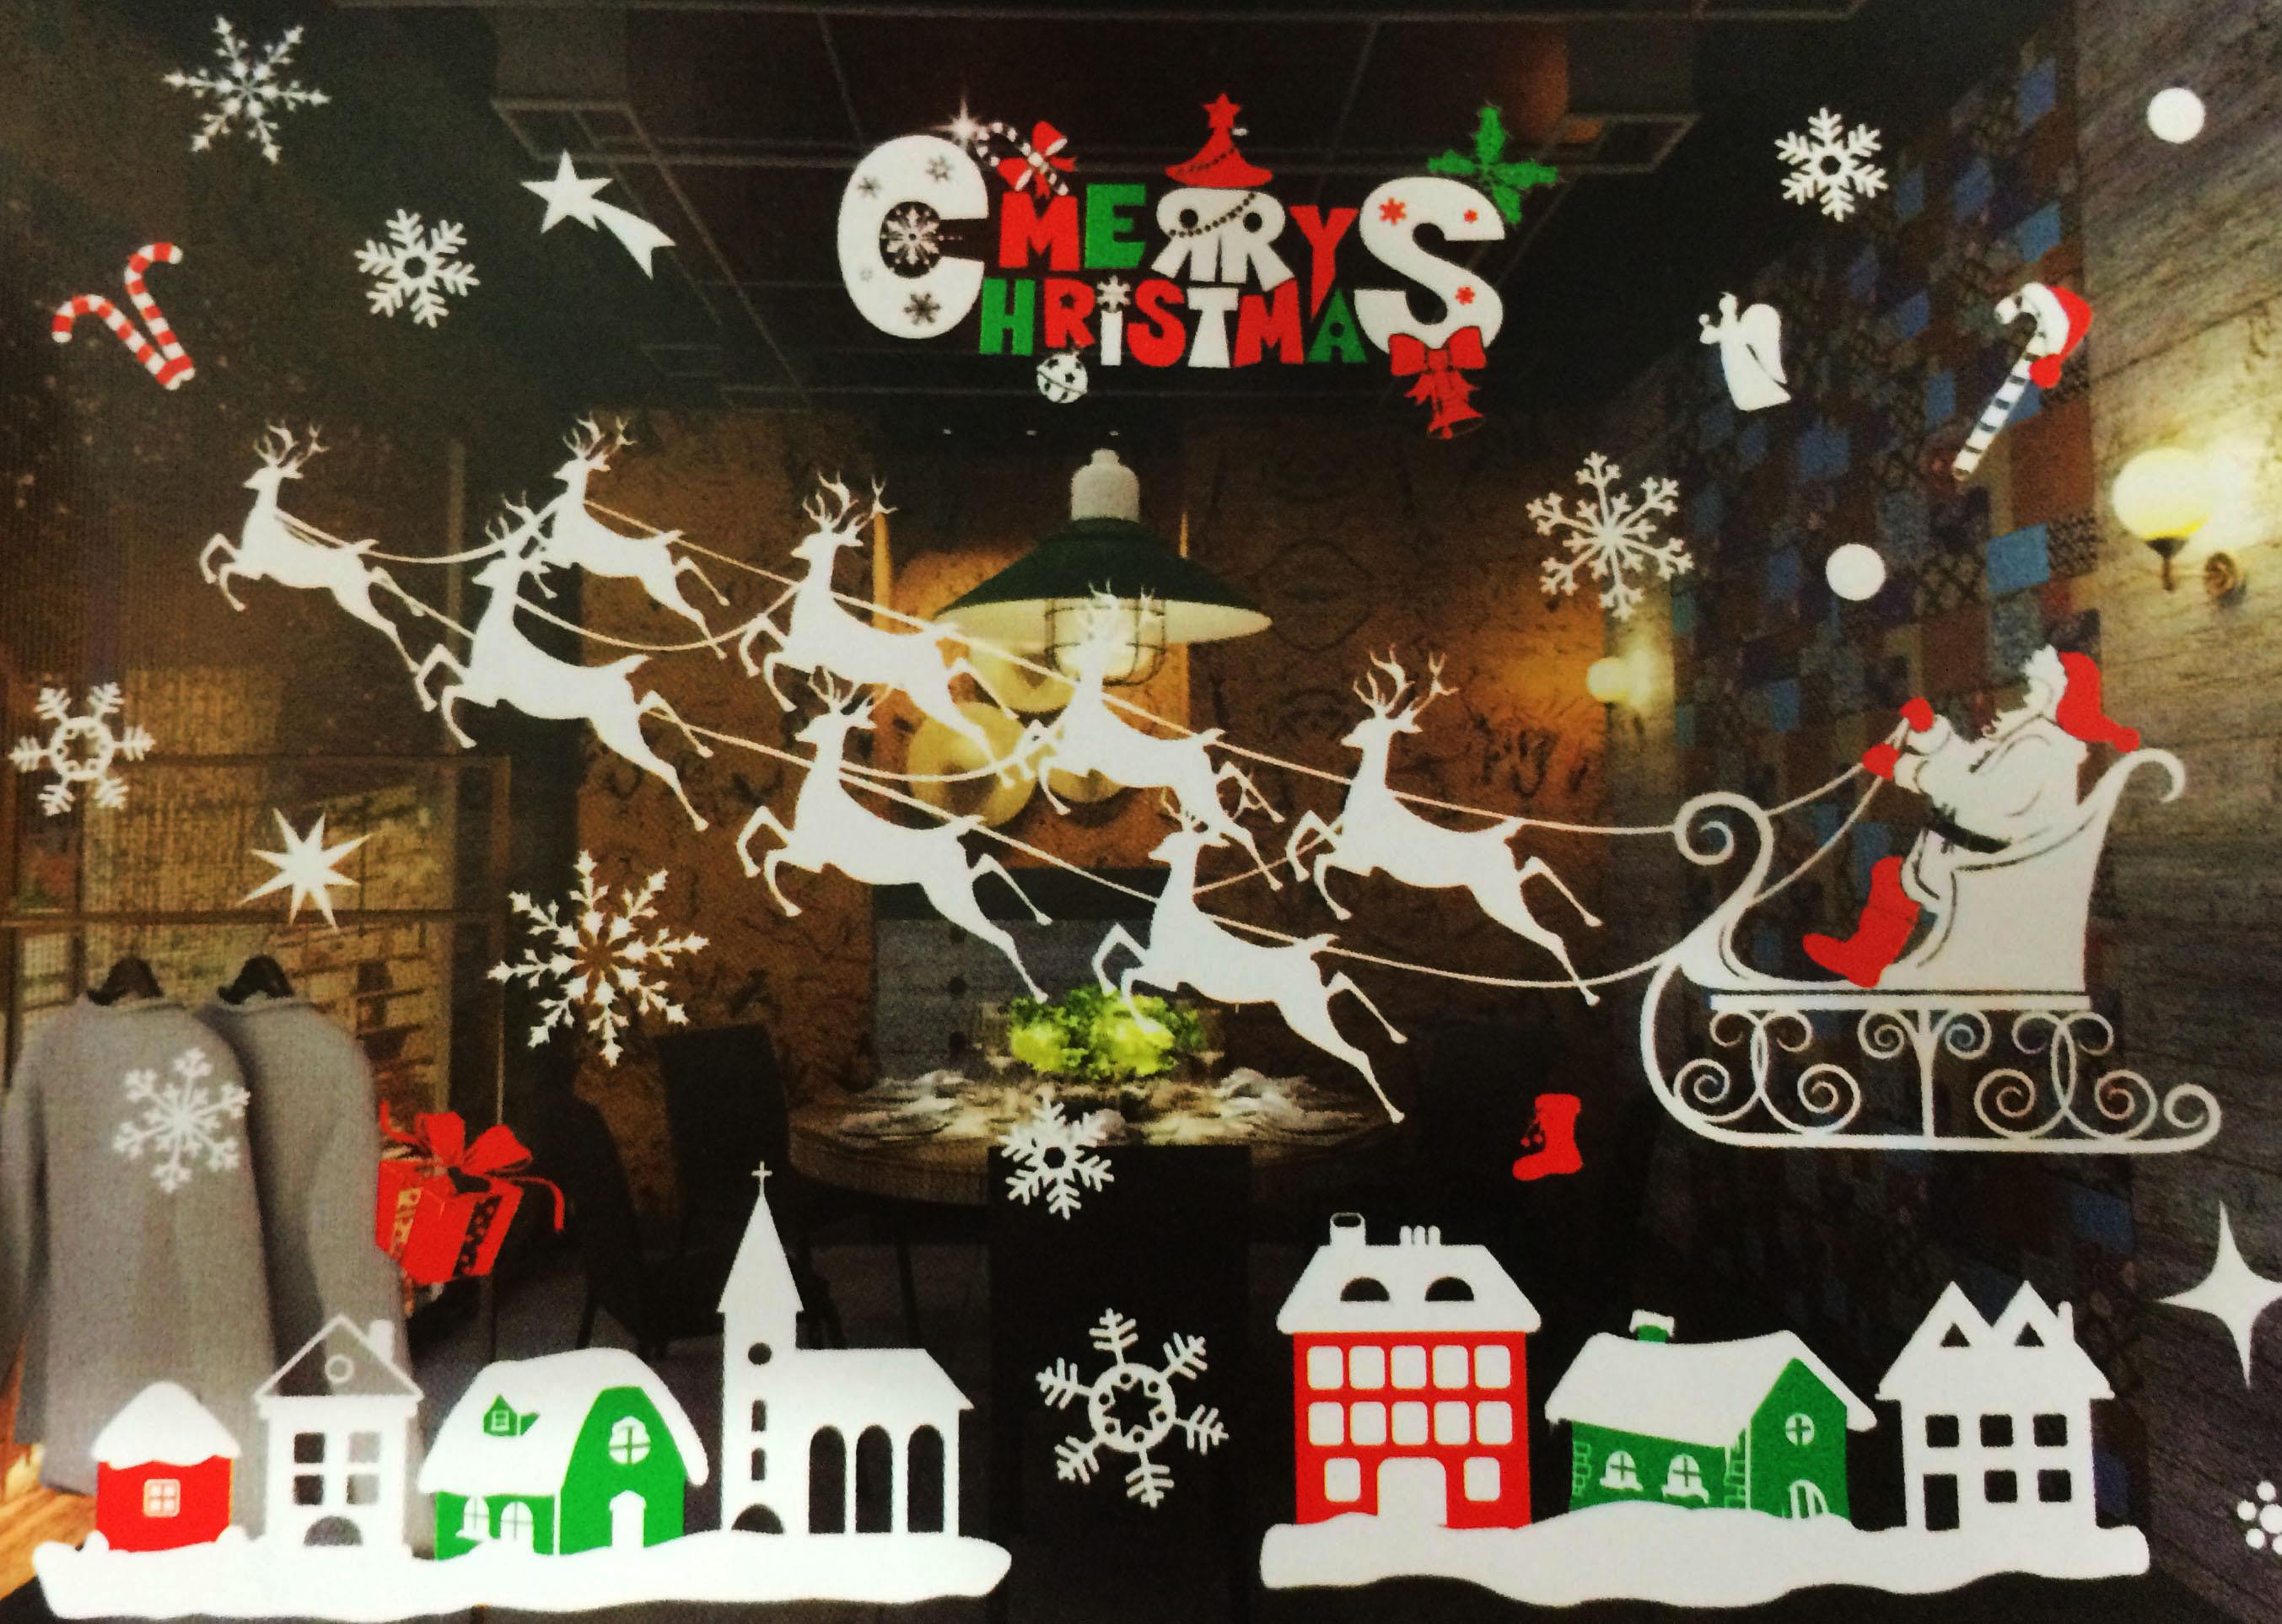 X射線【X150023】老人麋鹿靜電窗貼,聖誕節/聖誕擺飾/聖誕佈置/聖誕造景/聖誕裝飾/玻璃貼/牆面佈置/壁貼